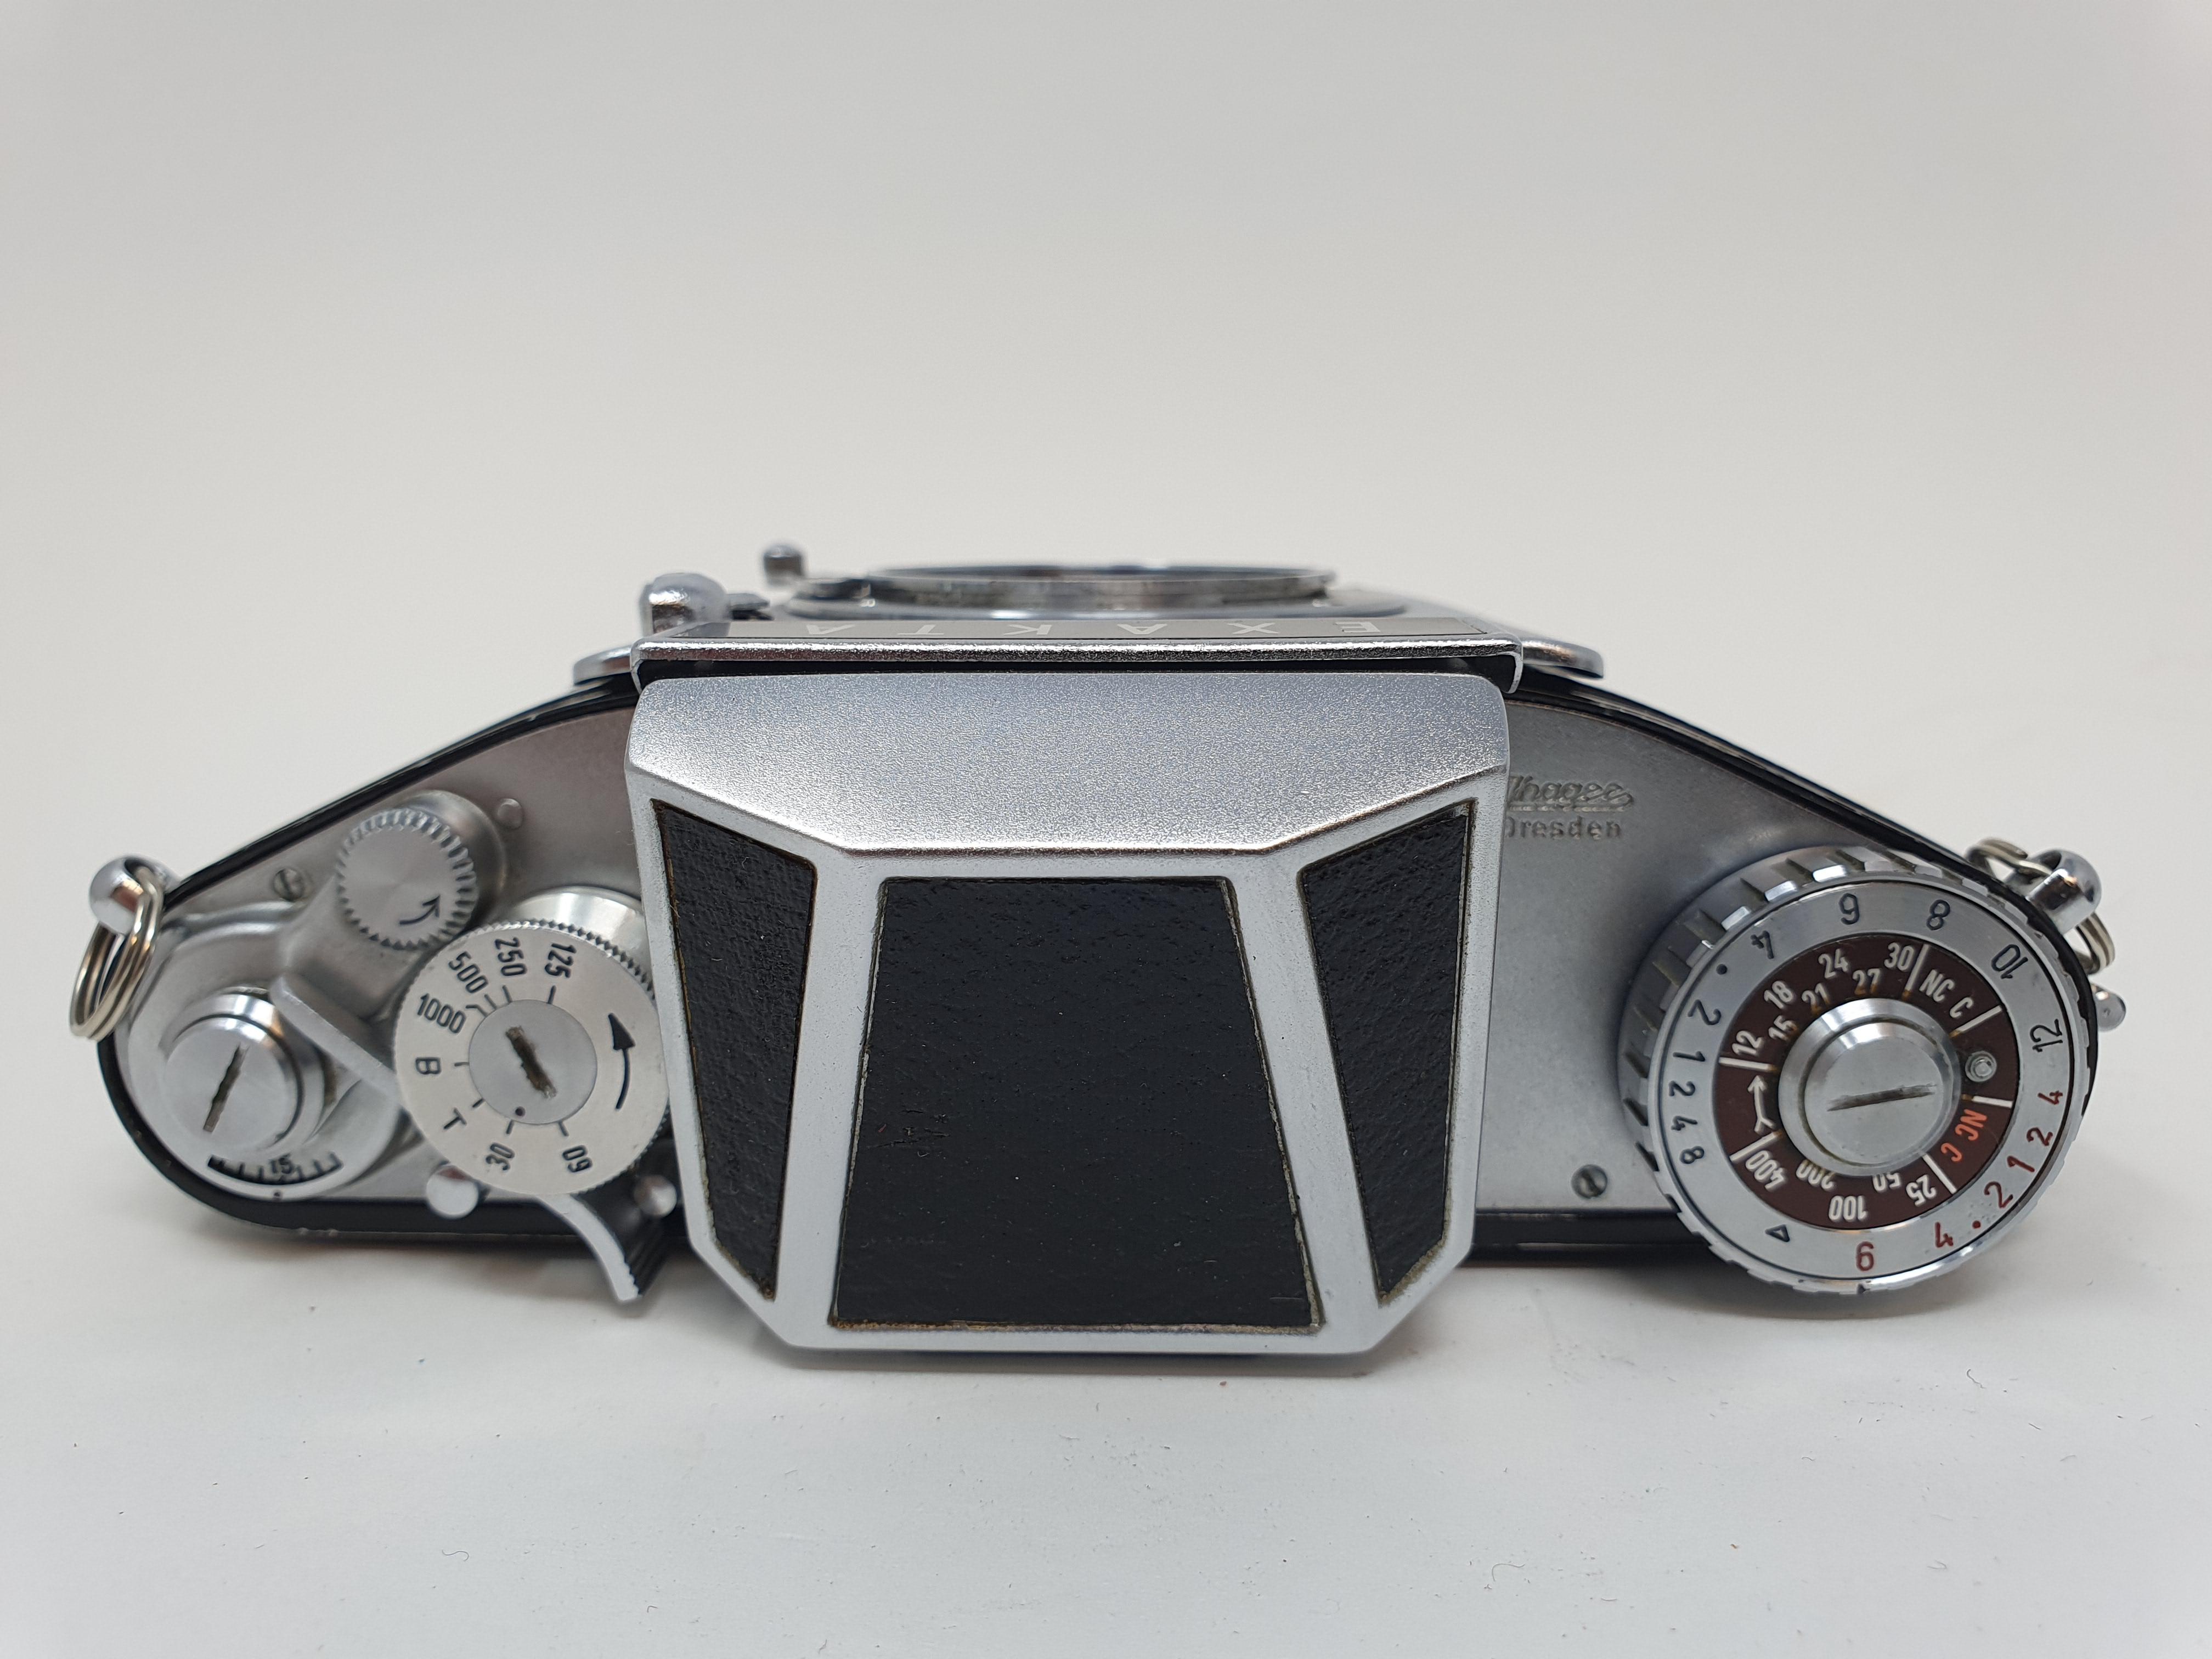 An Exakta Varex IIa camera, Varex IIb camera body, and an Exa. I (3) Provenance: Part of a vast - Image 5 of 6